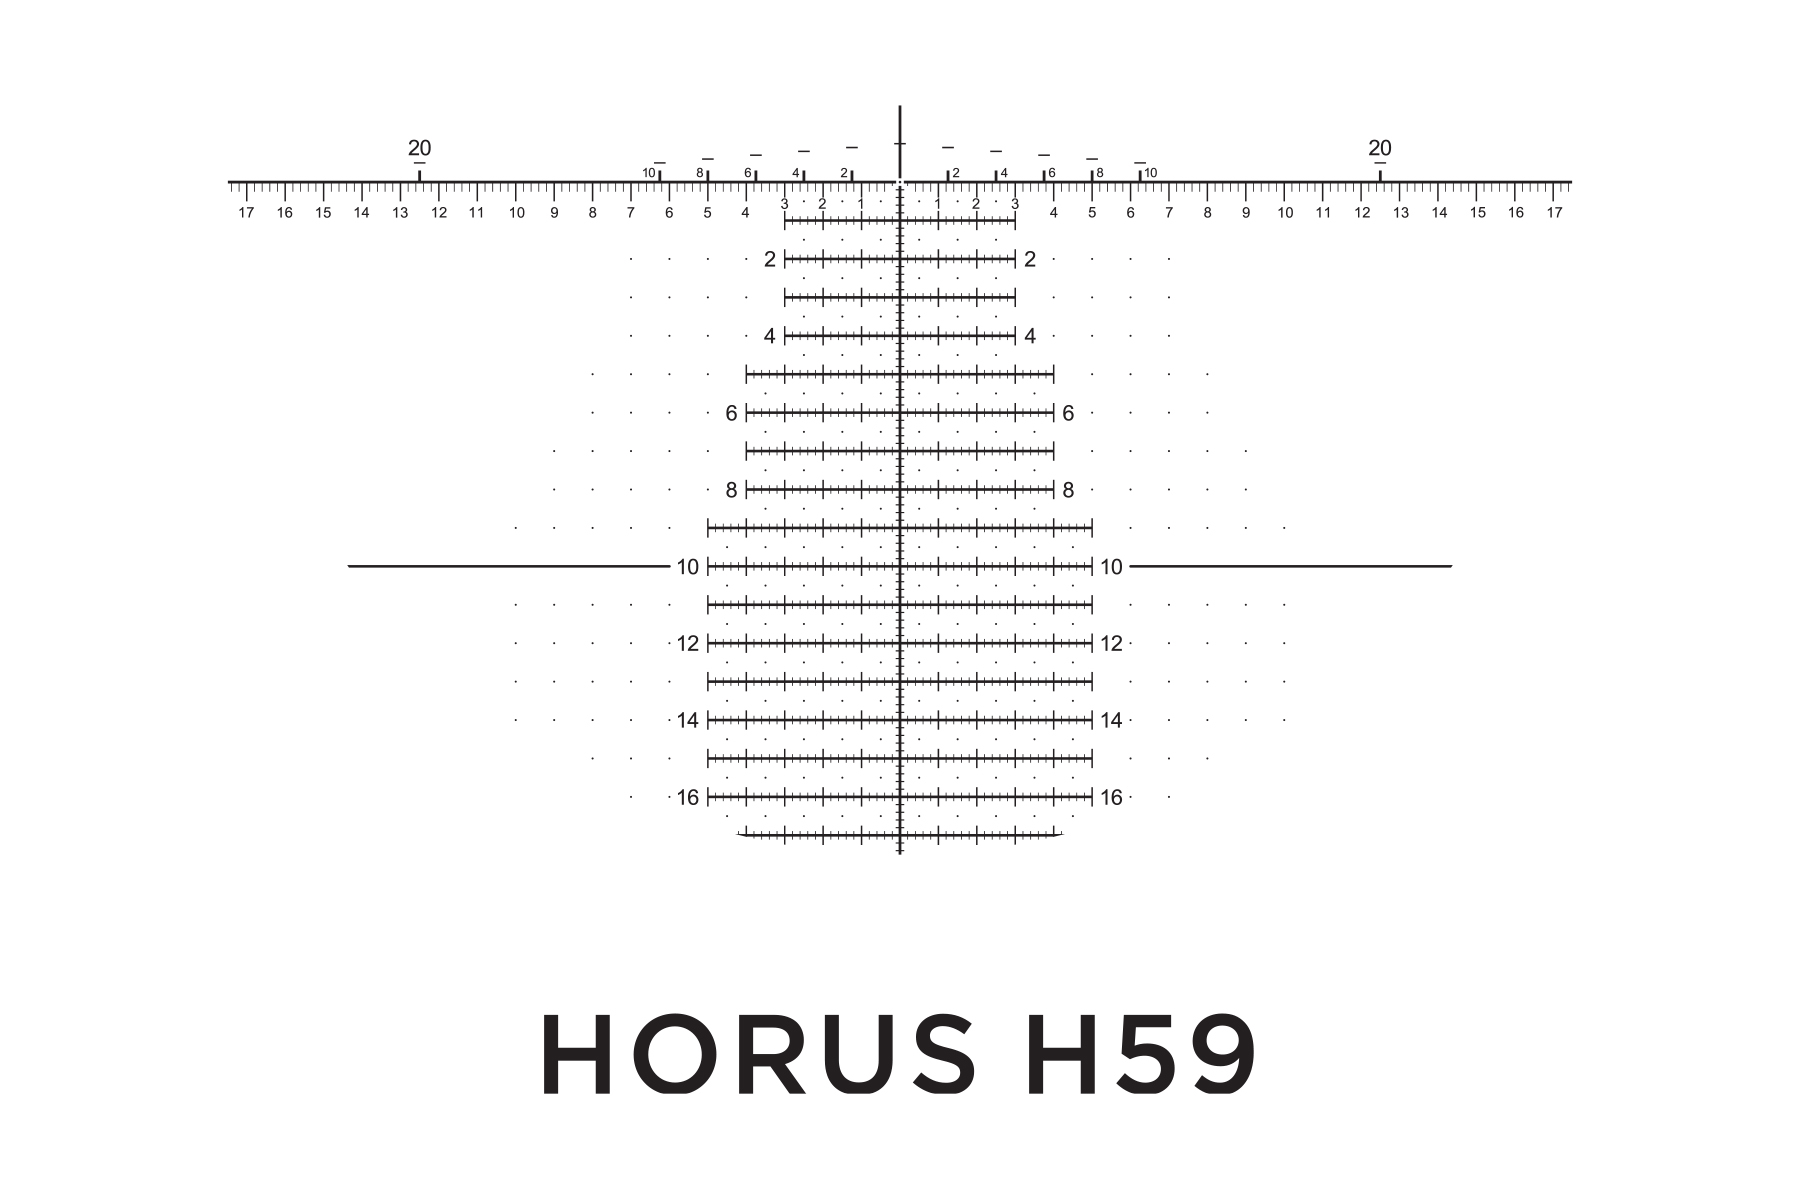 HORUS_H59_Reticle_VUDU